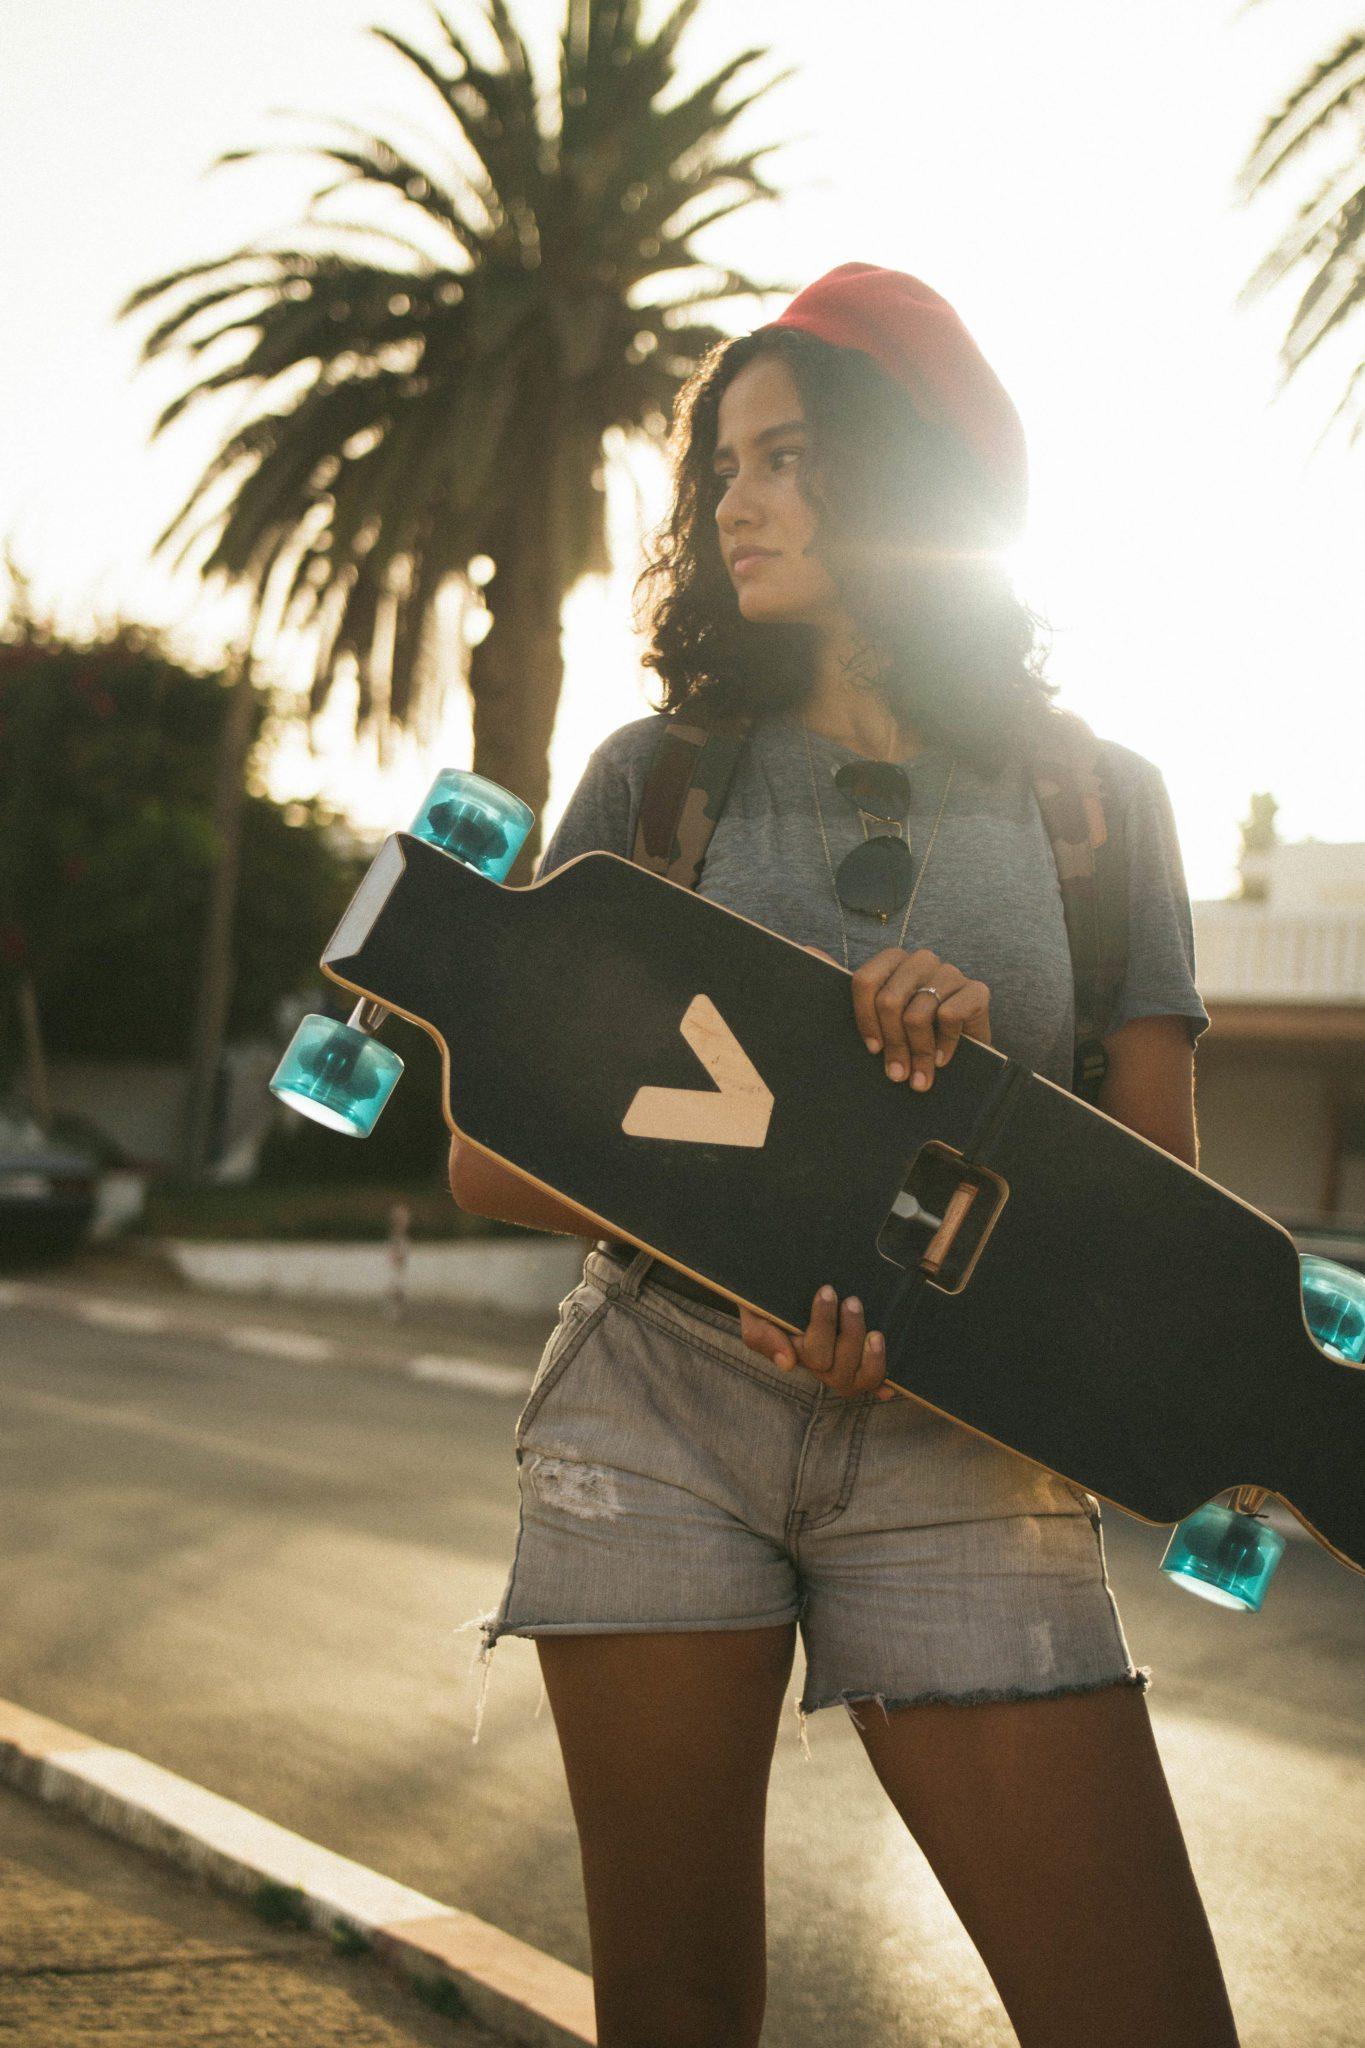 boardup-folding-skate-beach-flare-girl-justdalal-5-2